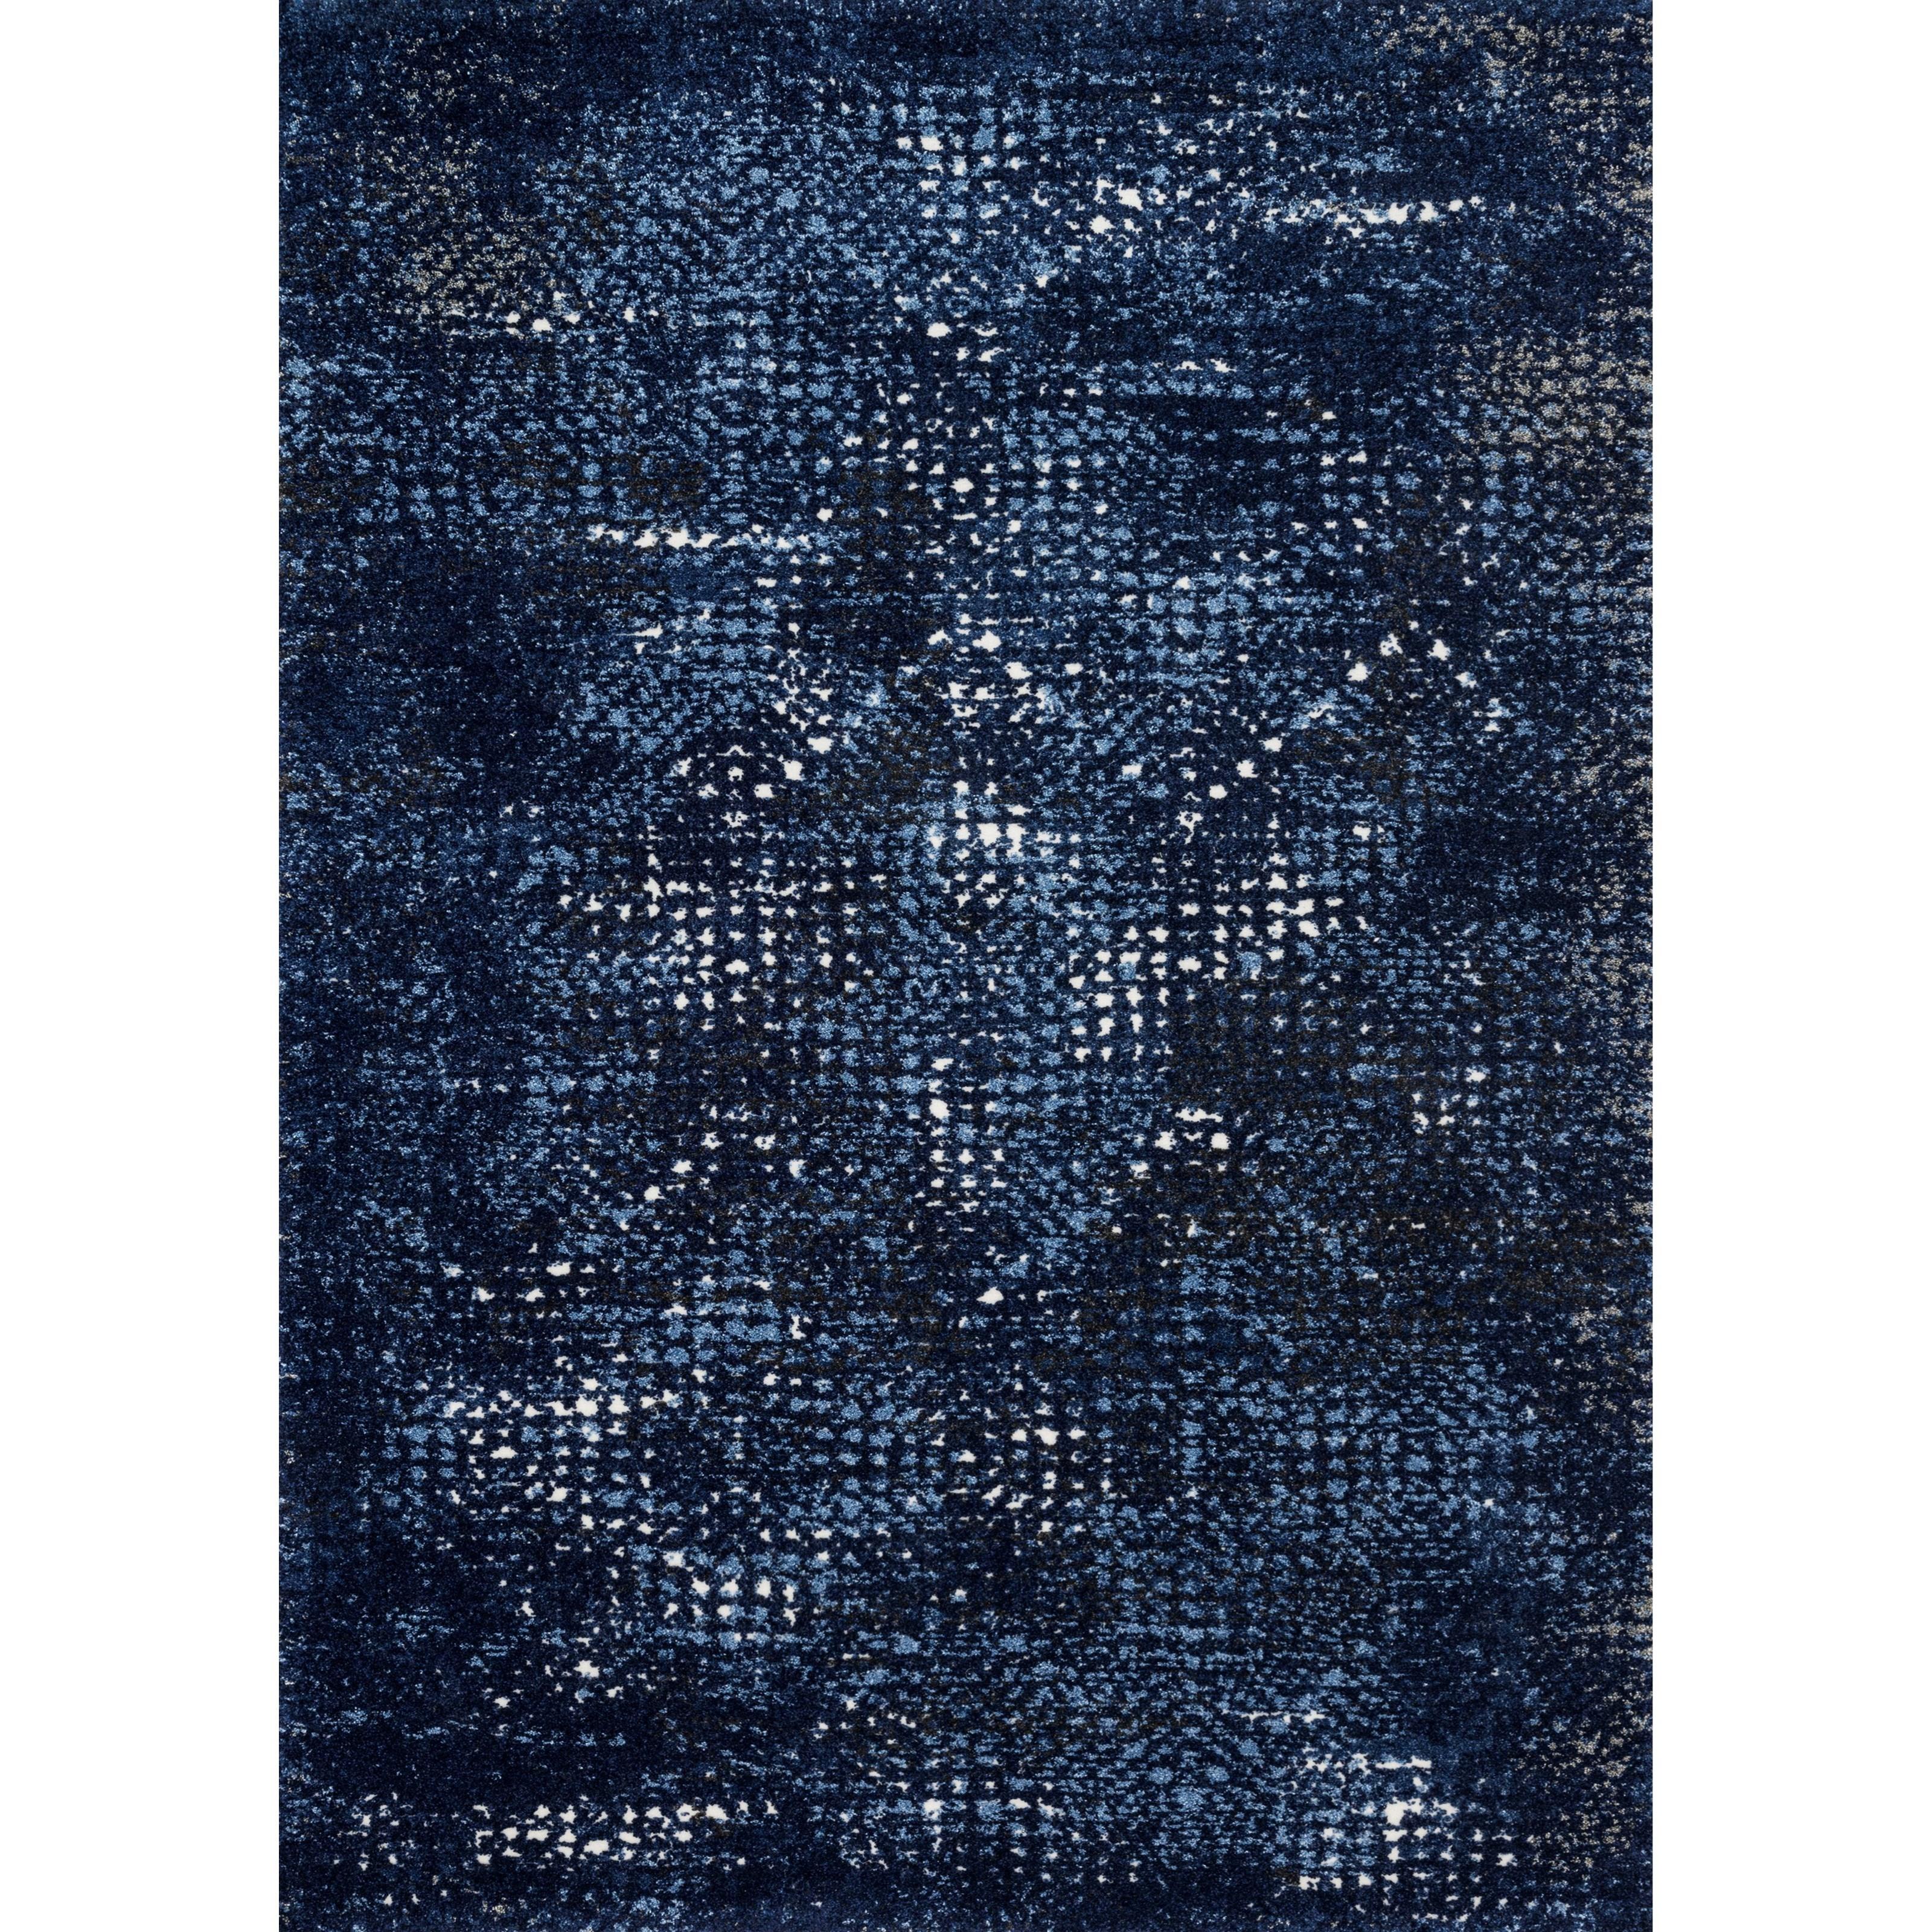 "Viera 1'6"" x 1'6""  Dark Blue / Light Blue Rug by Loloi Rugs at Virginia Furniture Market"